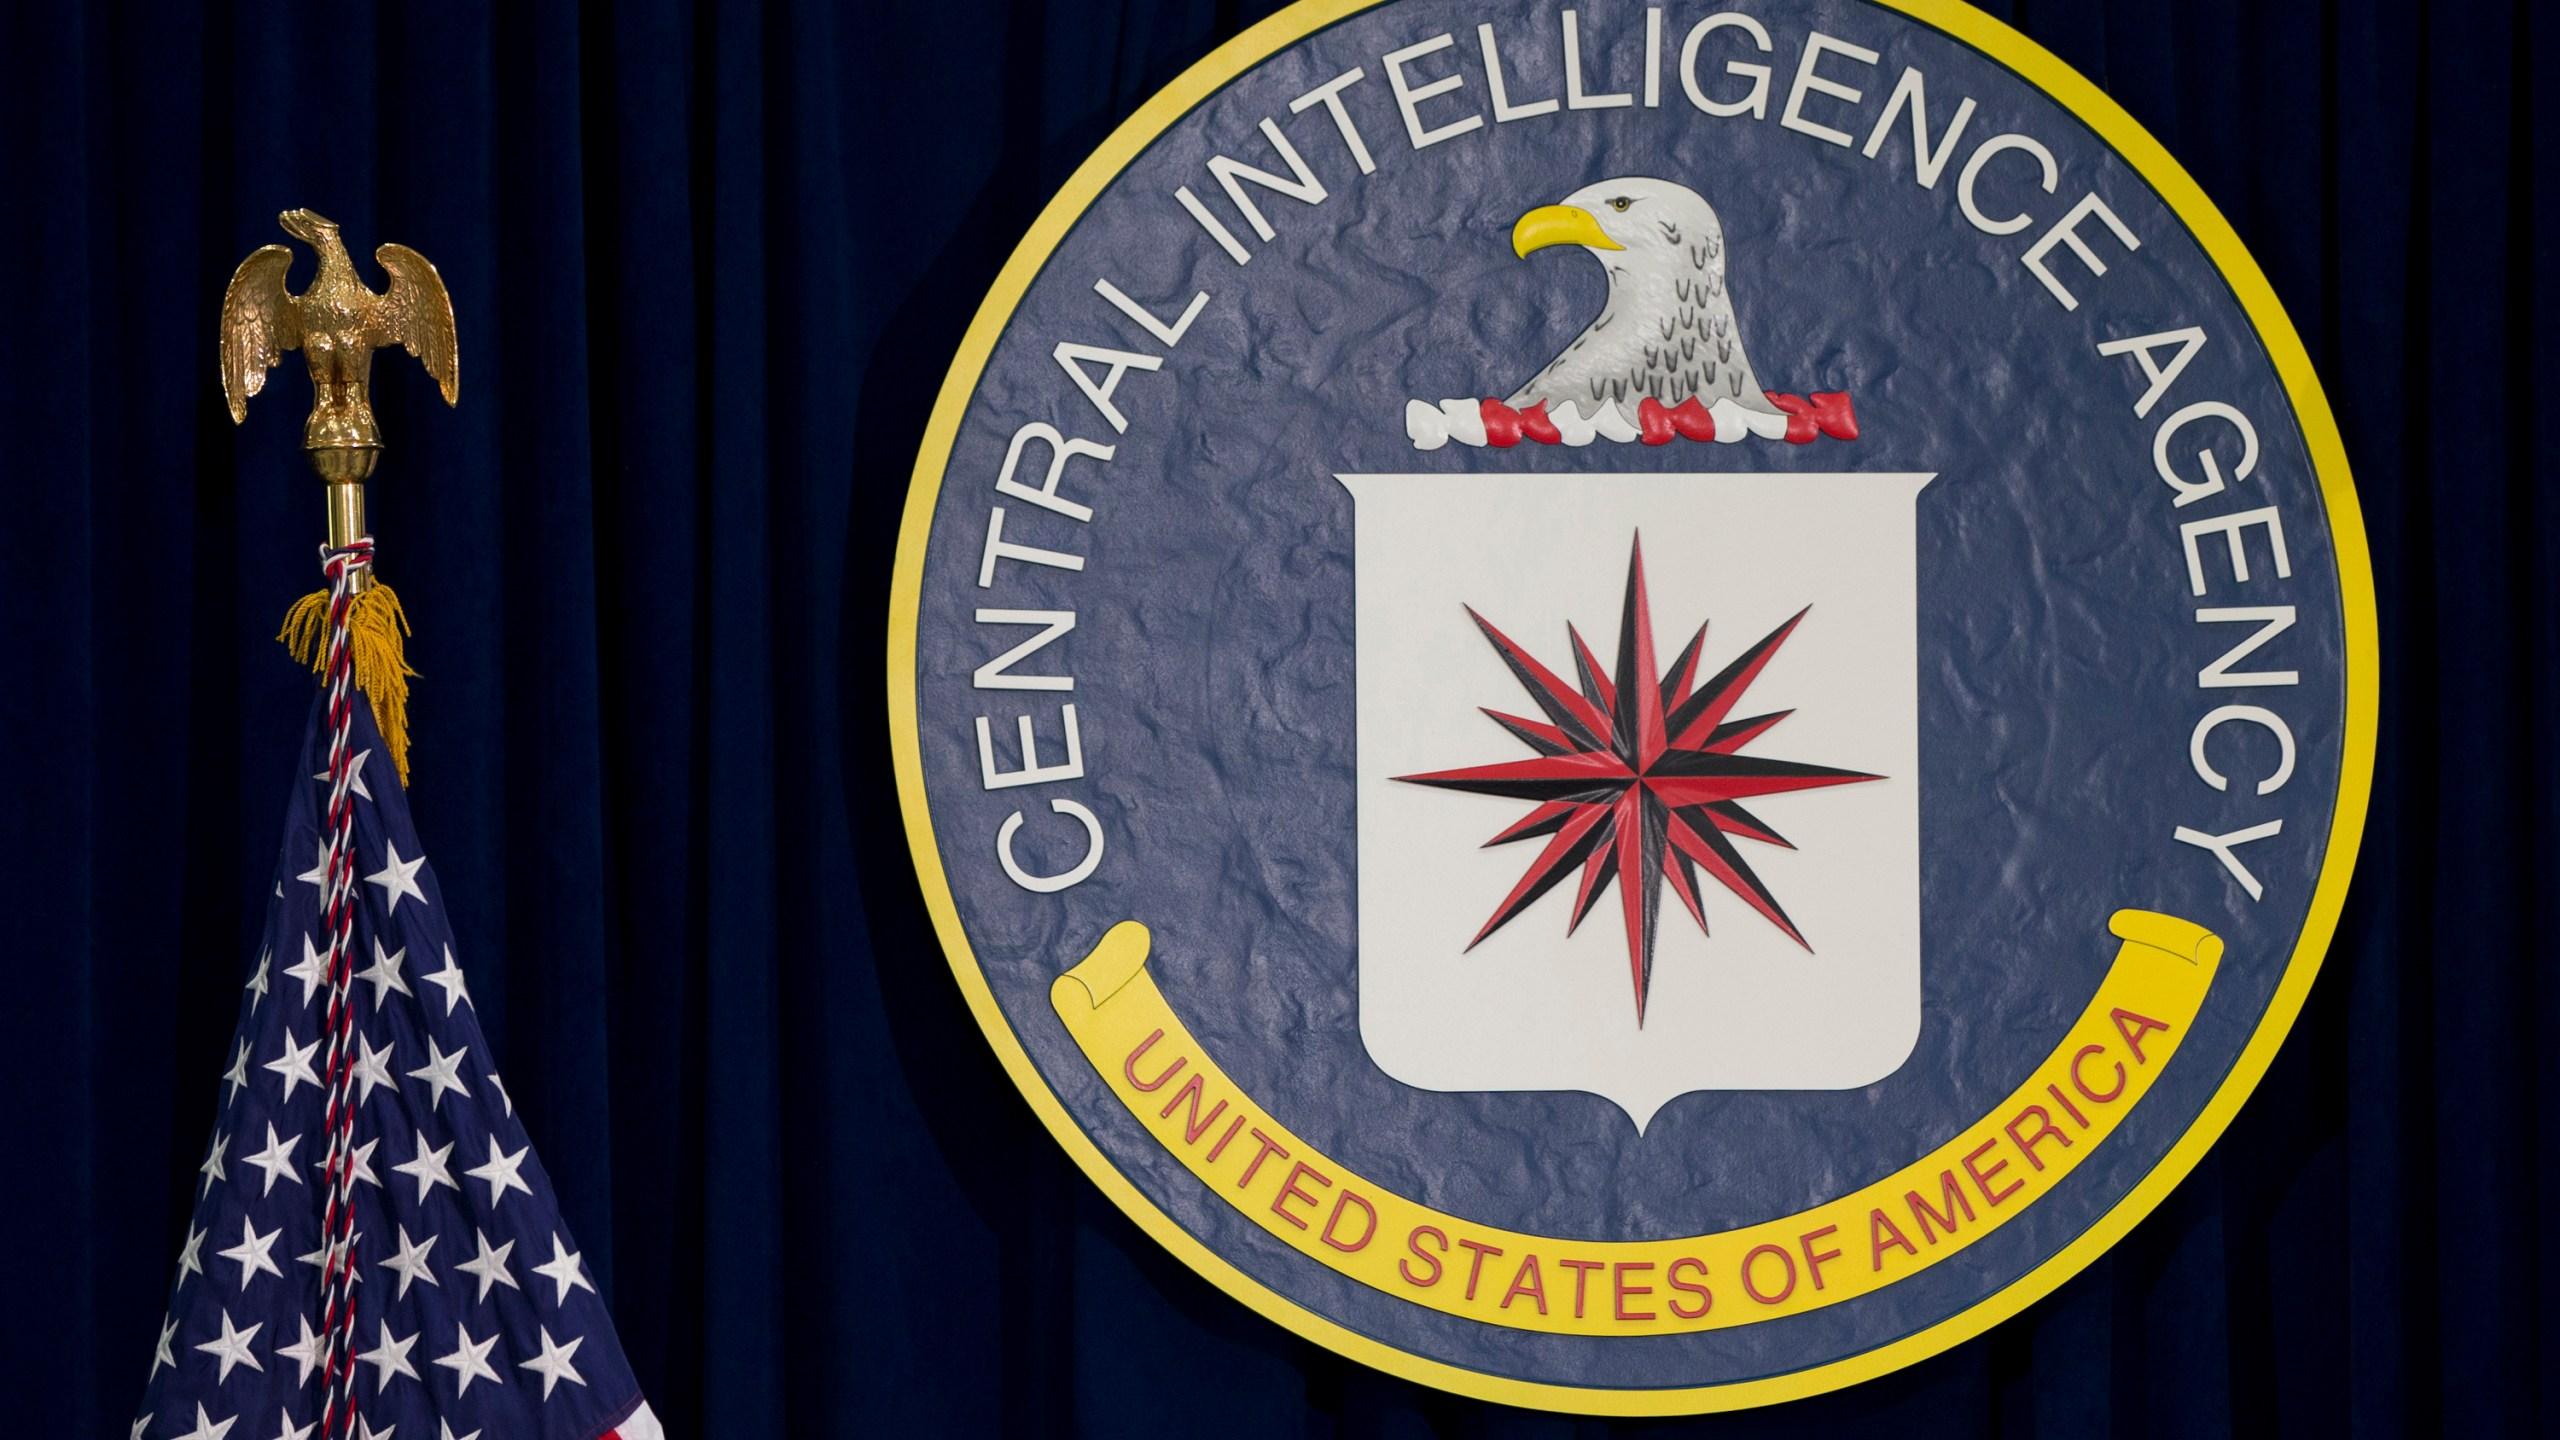 Central Intelligence Agency seal, CIA seal, logo